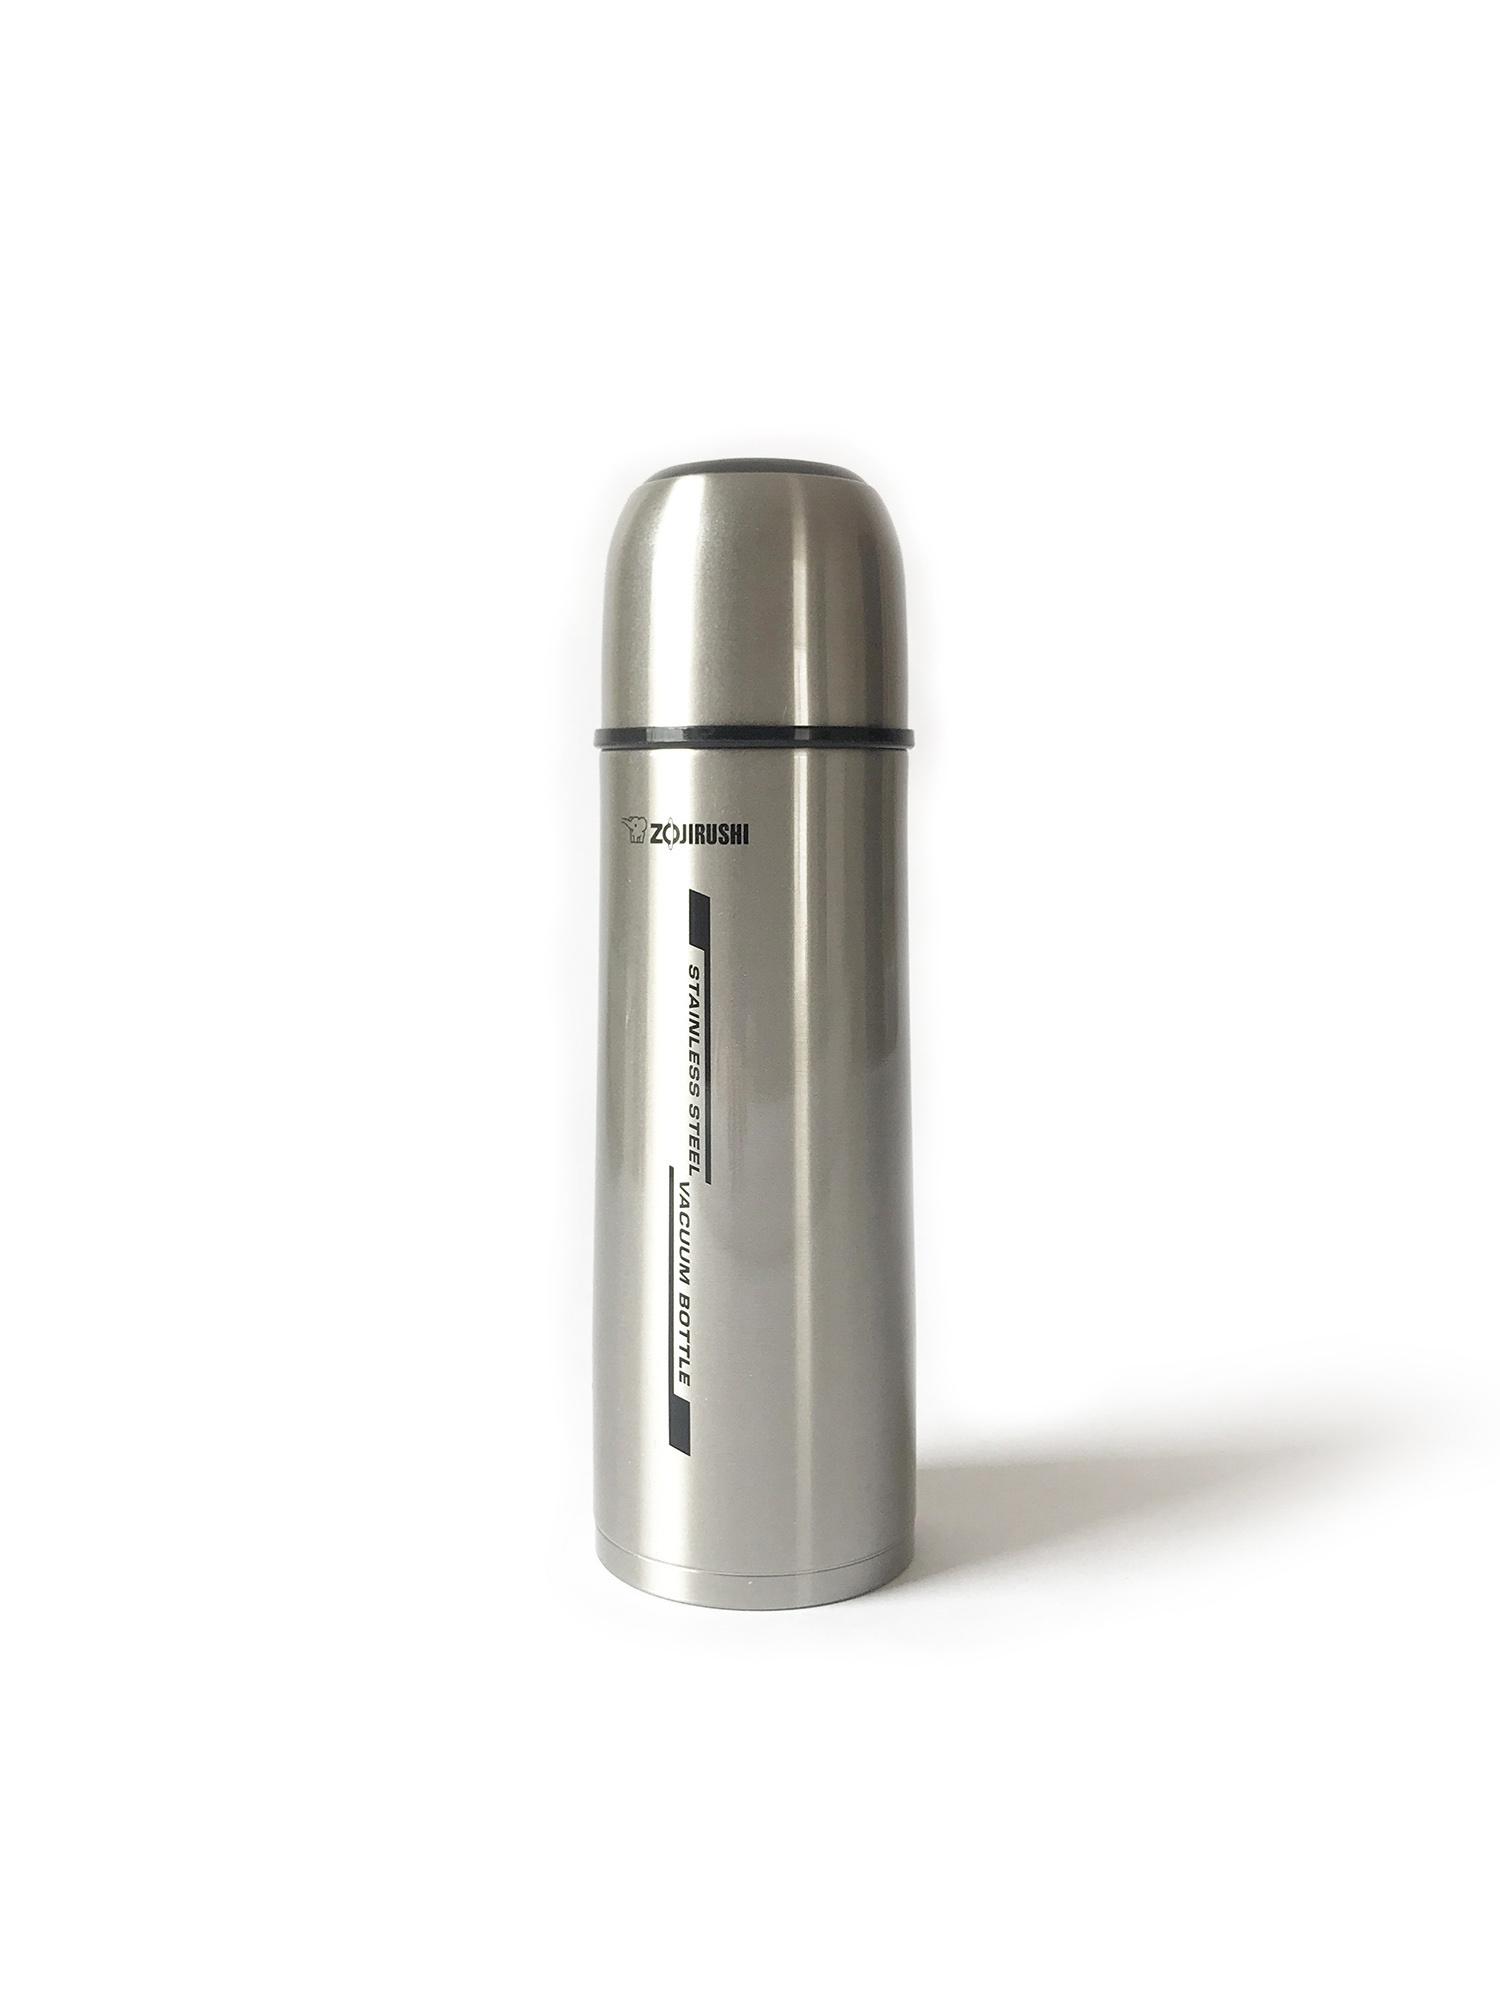 Zojirushi Vacuum Bottle in Stainless Steel, 17 oz.-1